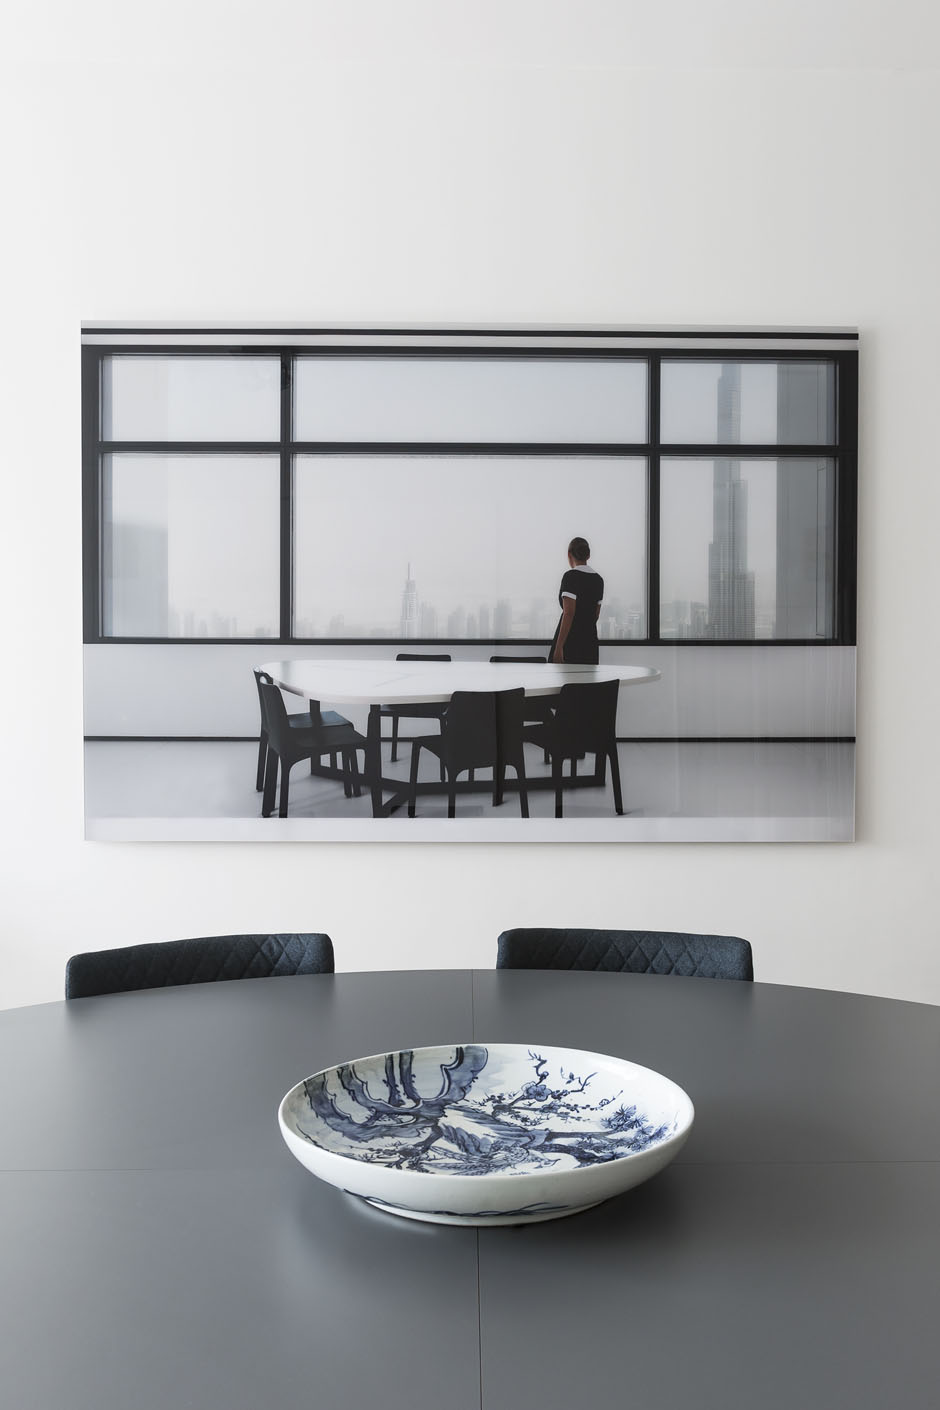 studio-hermanides-boutique-office-10.jpg